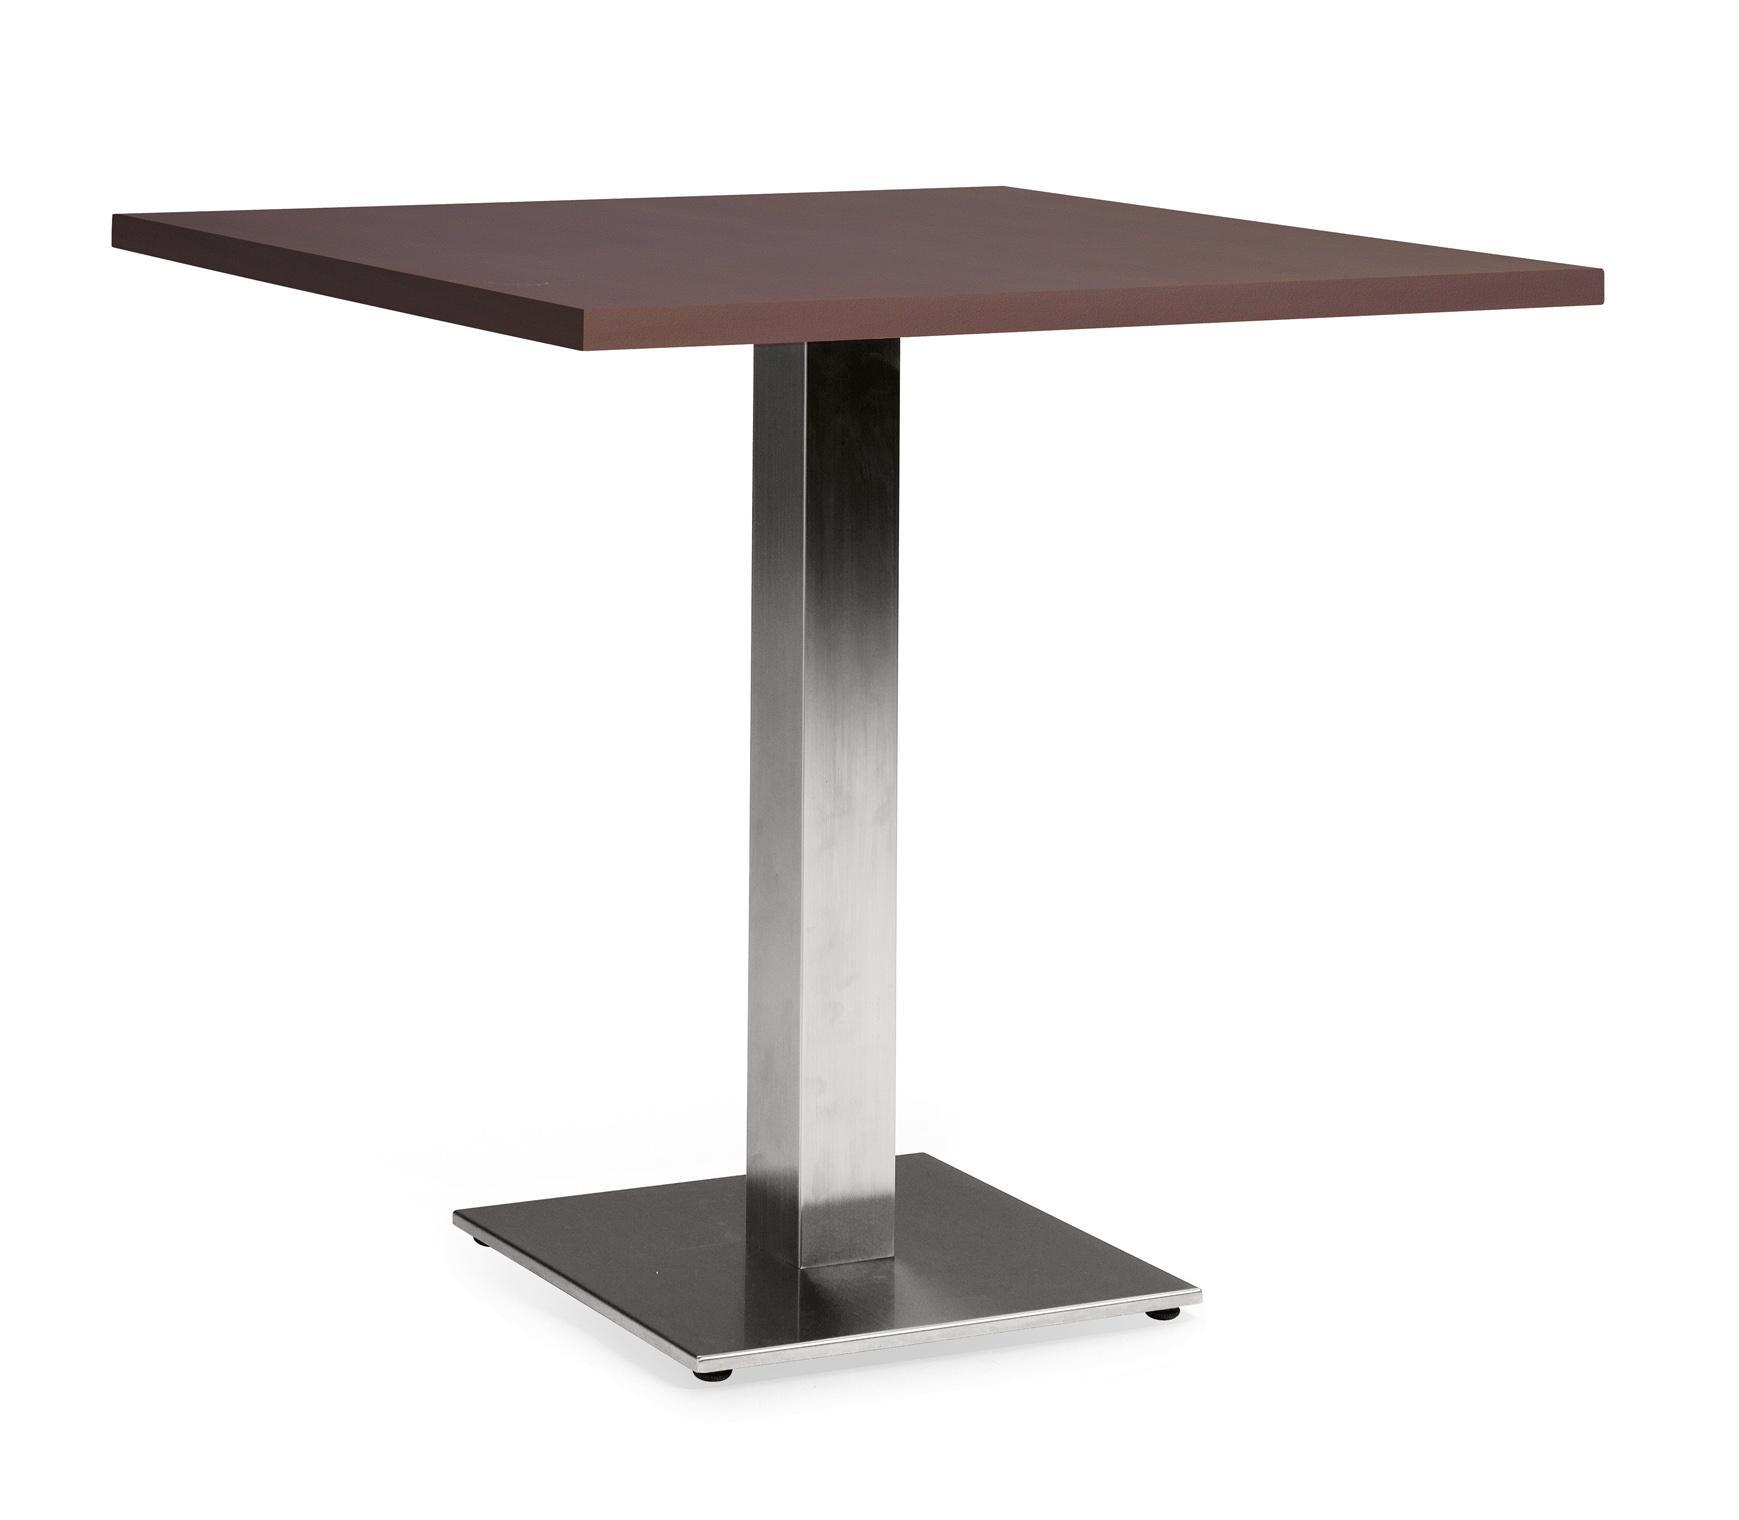 Pictures Of Furniture 桌子 设计 4 0 10000 0 件